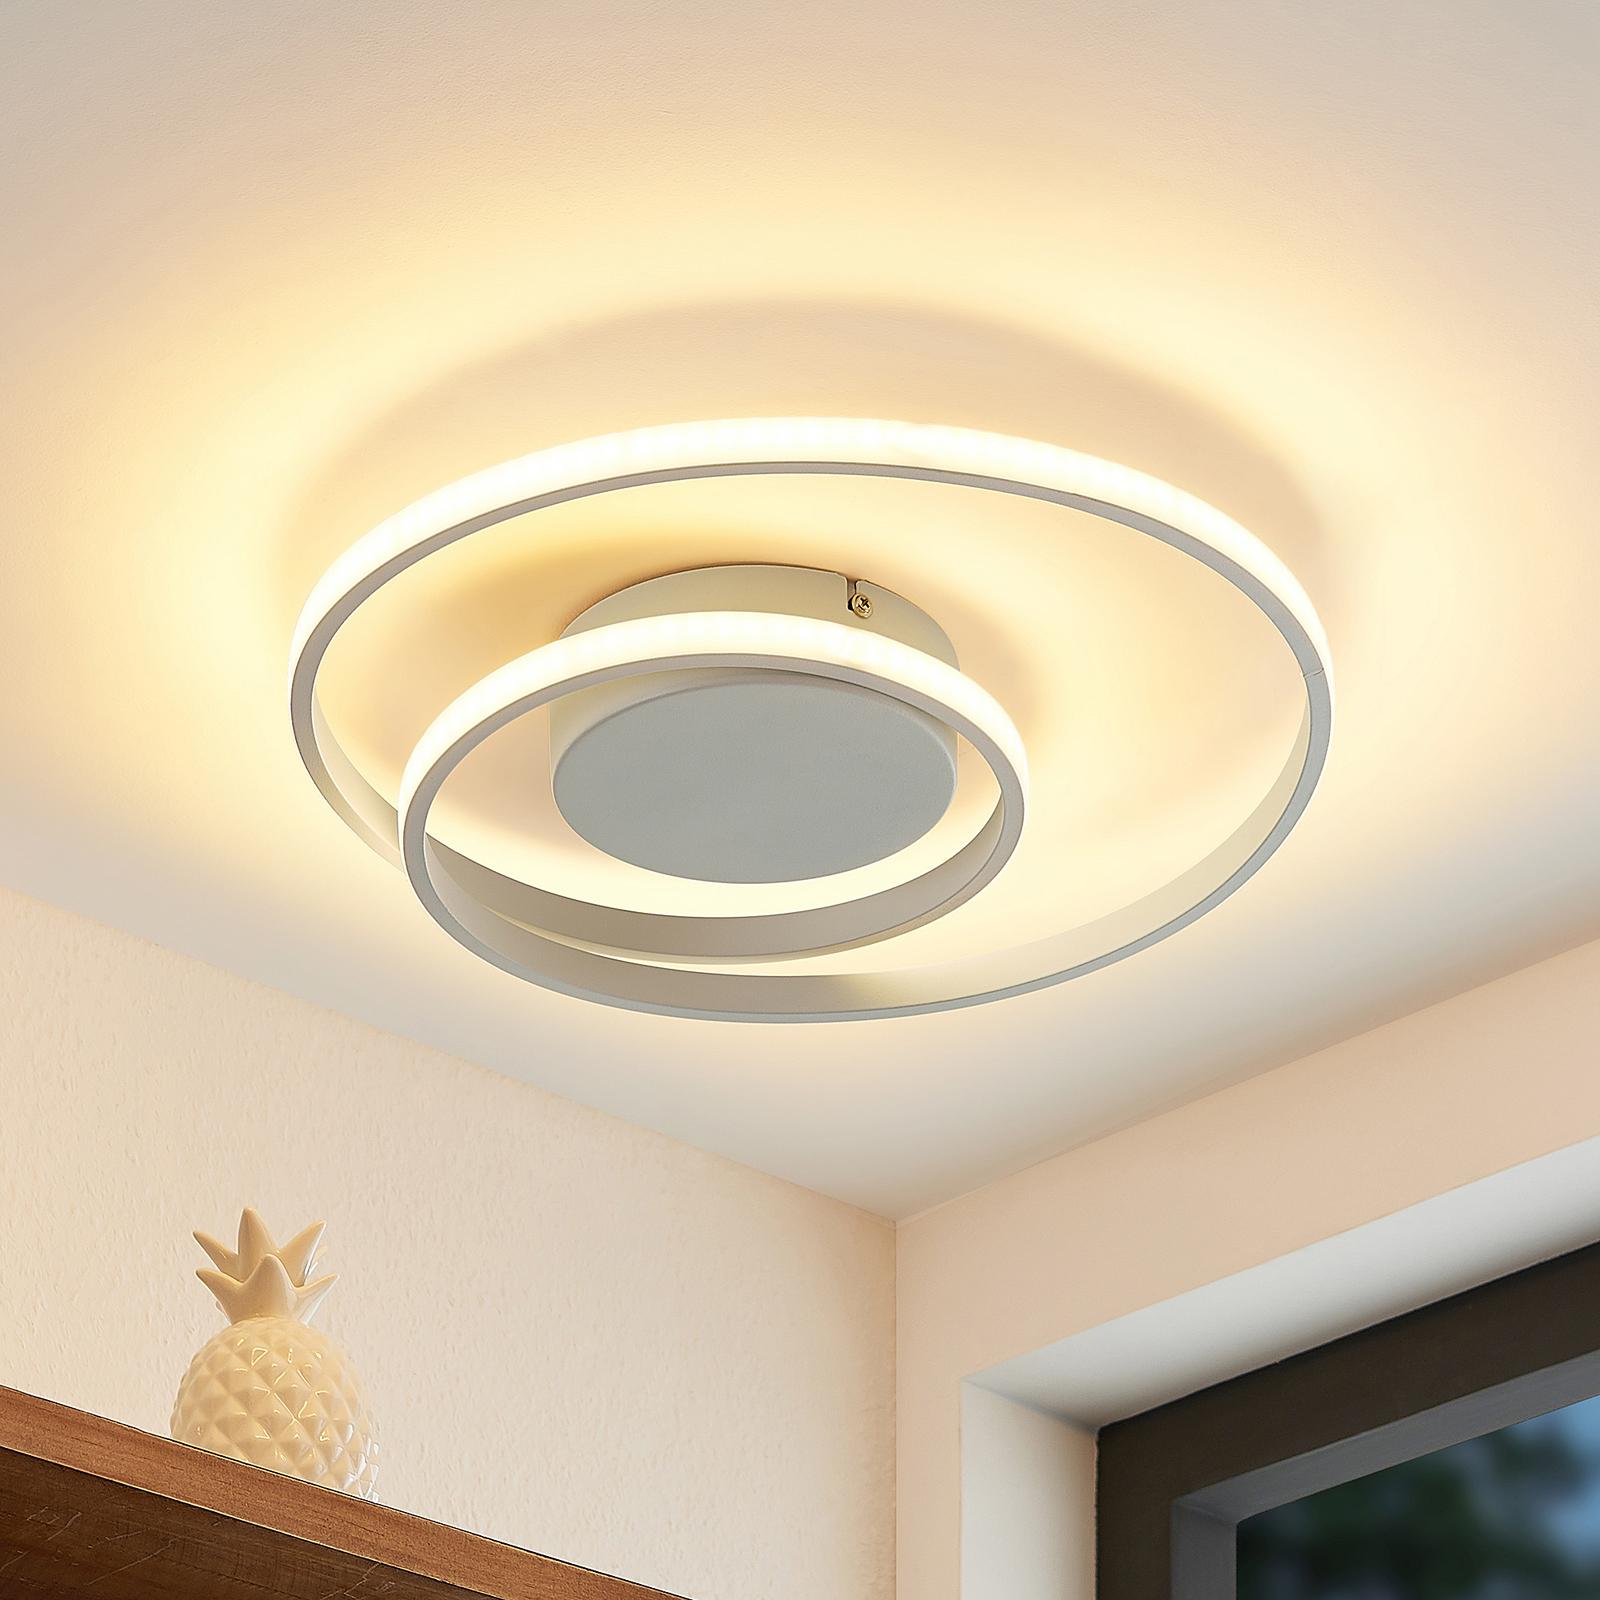 Lindby LED-Deckenlampe Emisua CCT dimmbar weiß